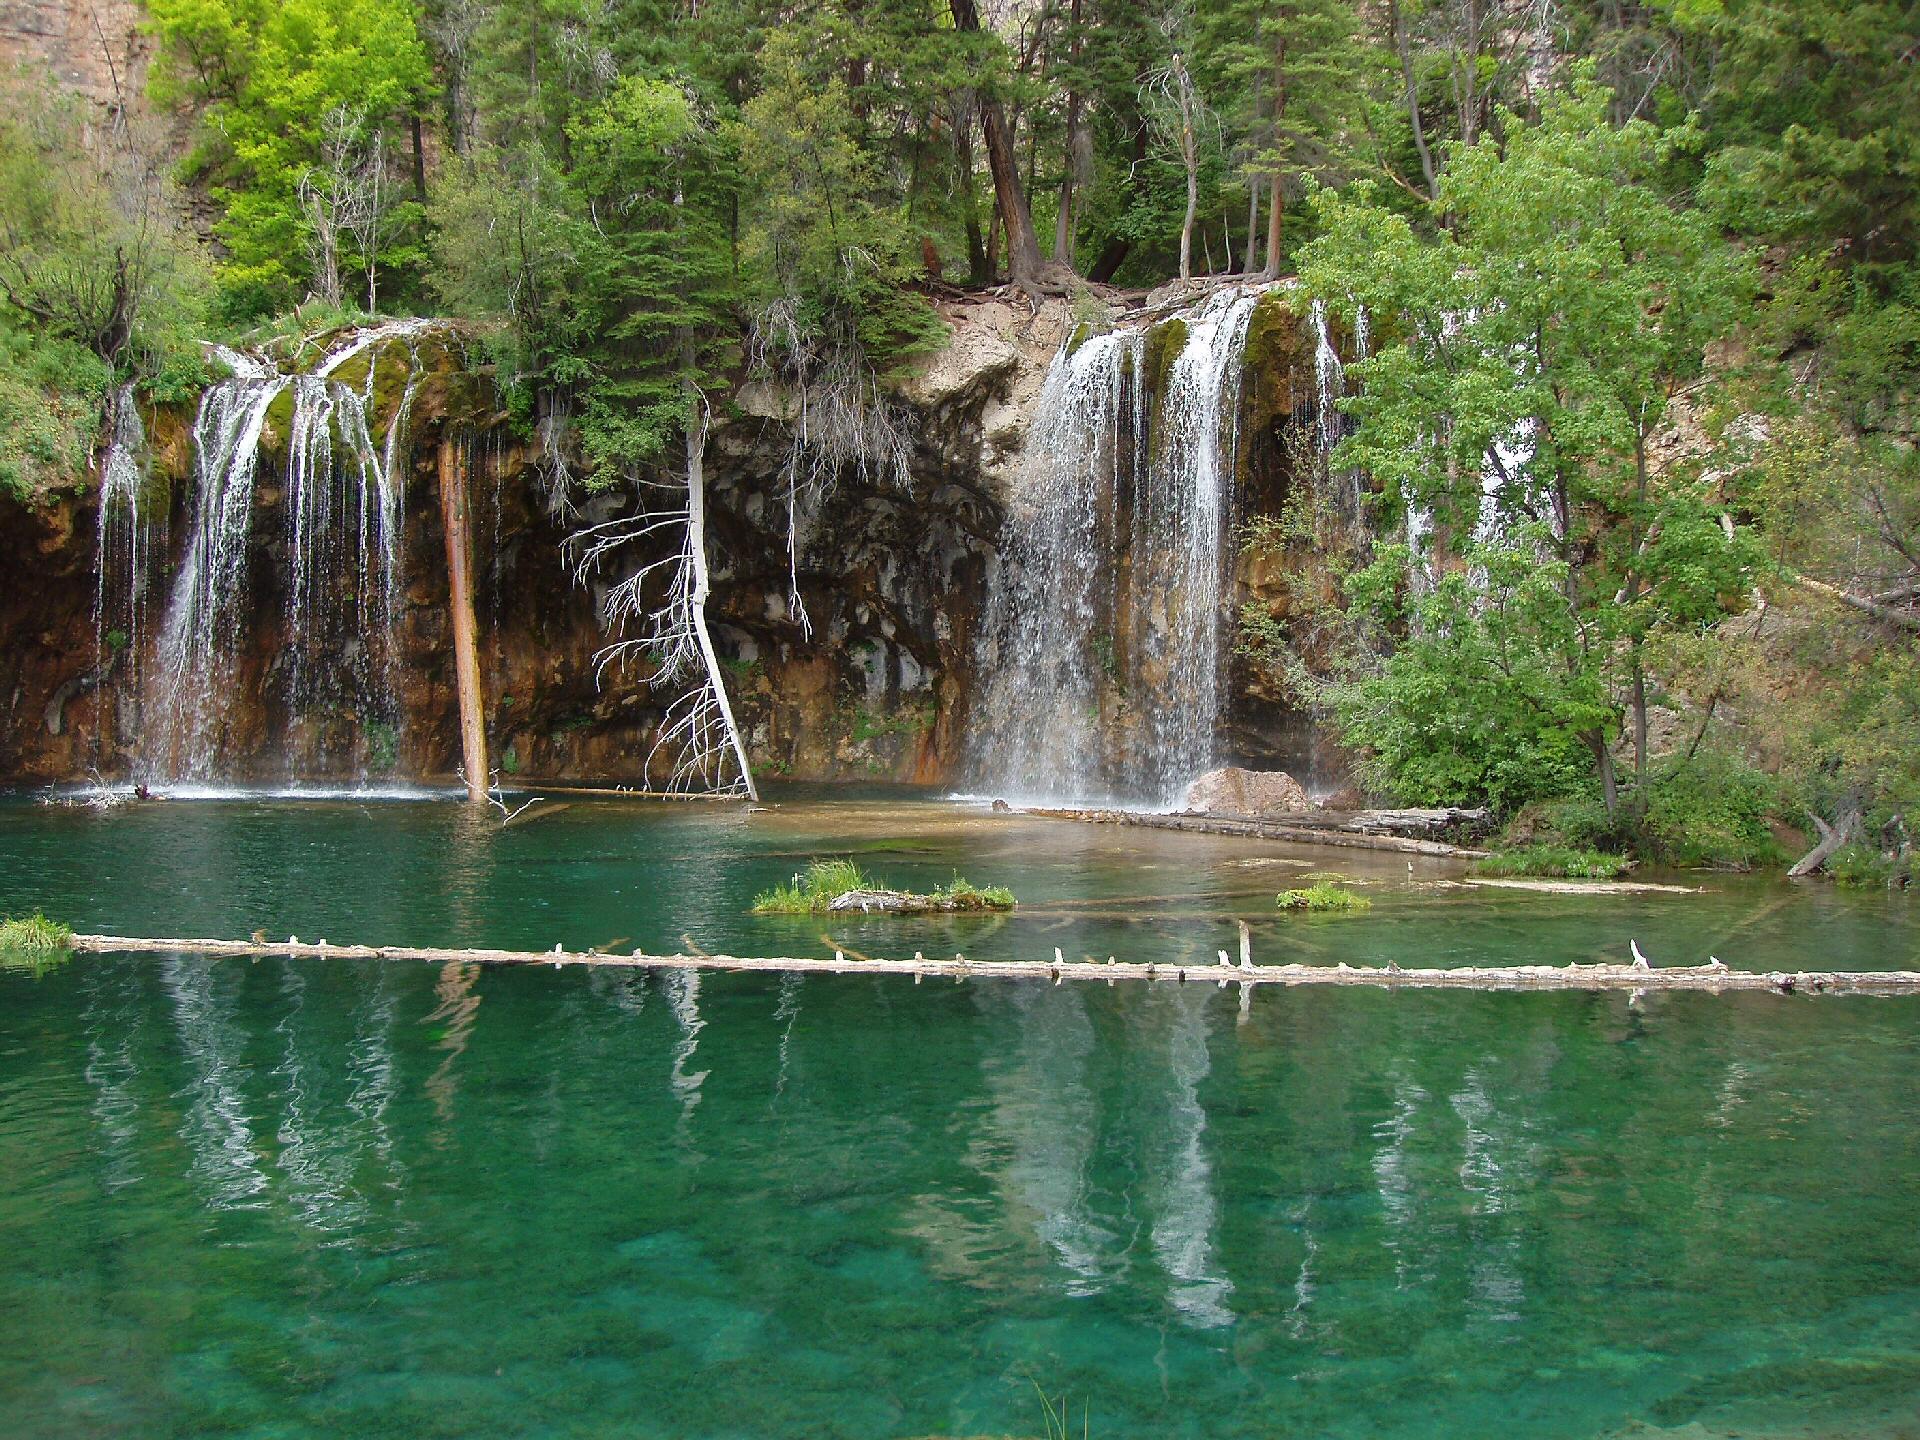 http://internetbrothers.org/images/hanging_lake_falls.jpg